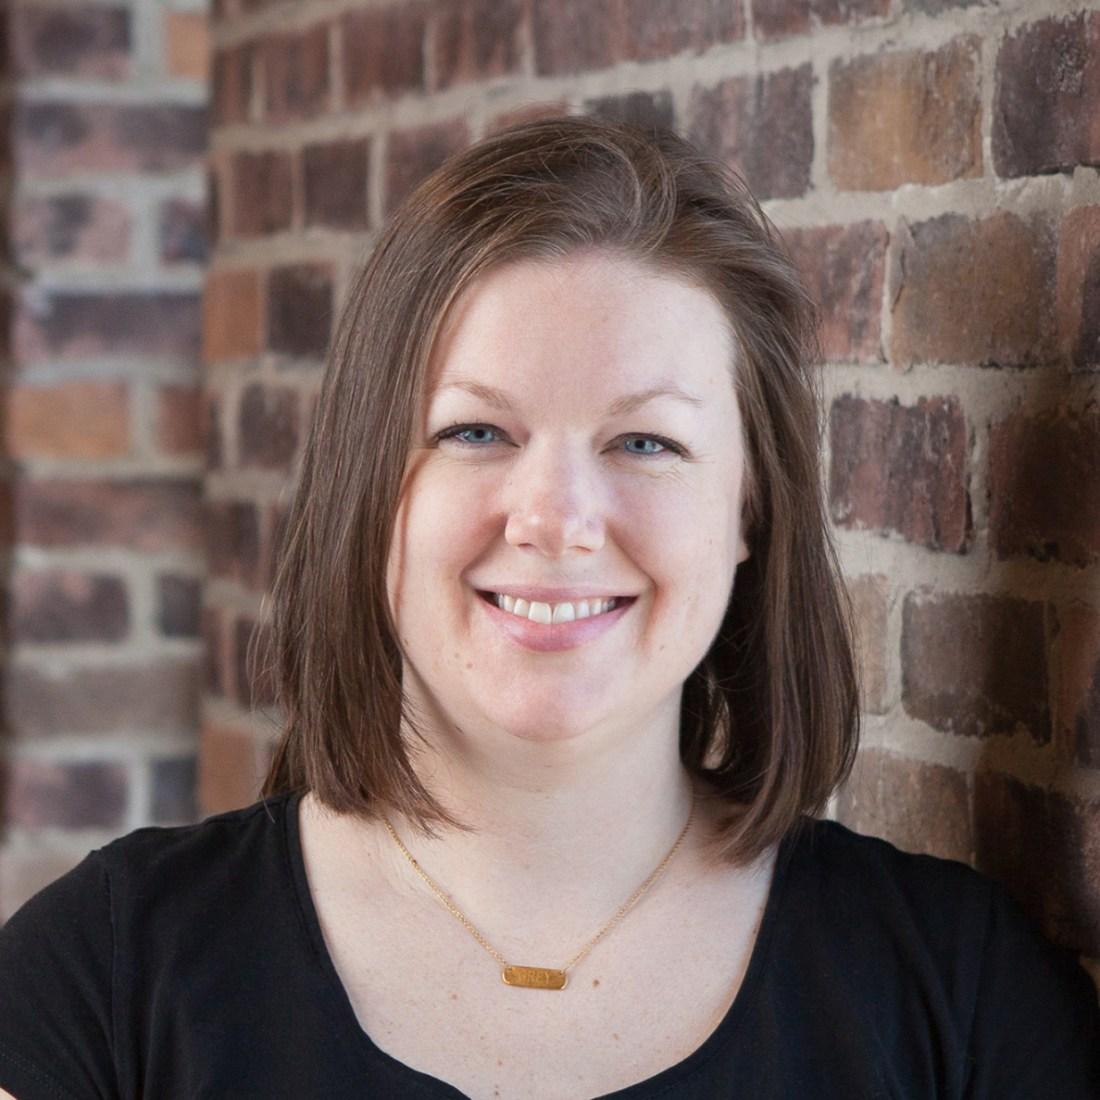 Katelyn Stokes